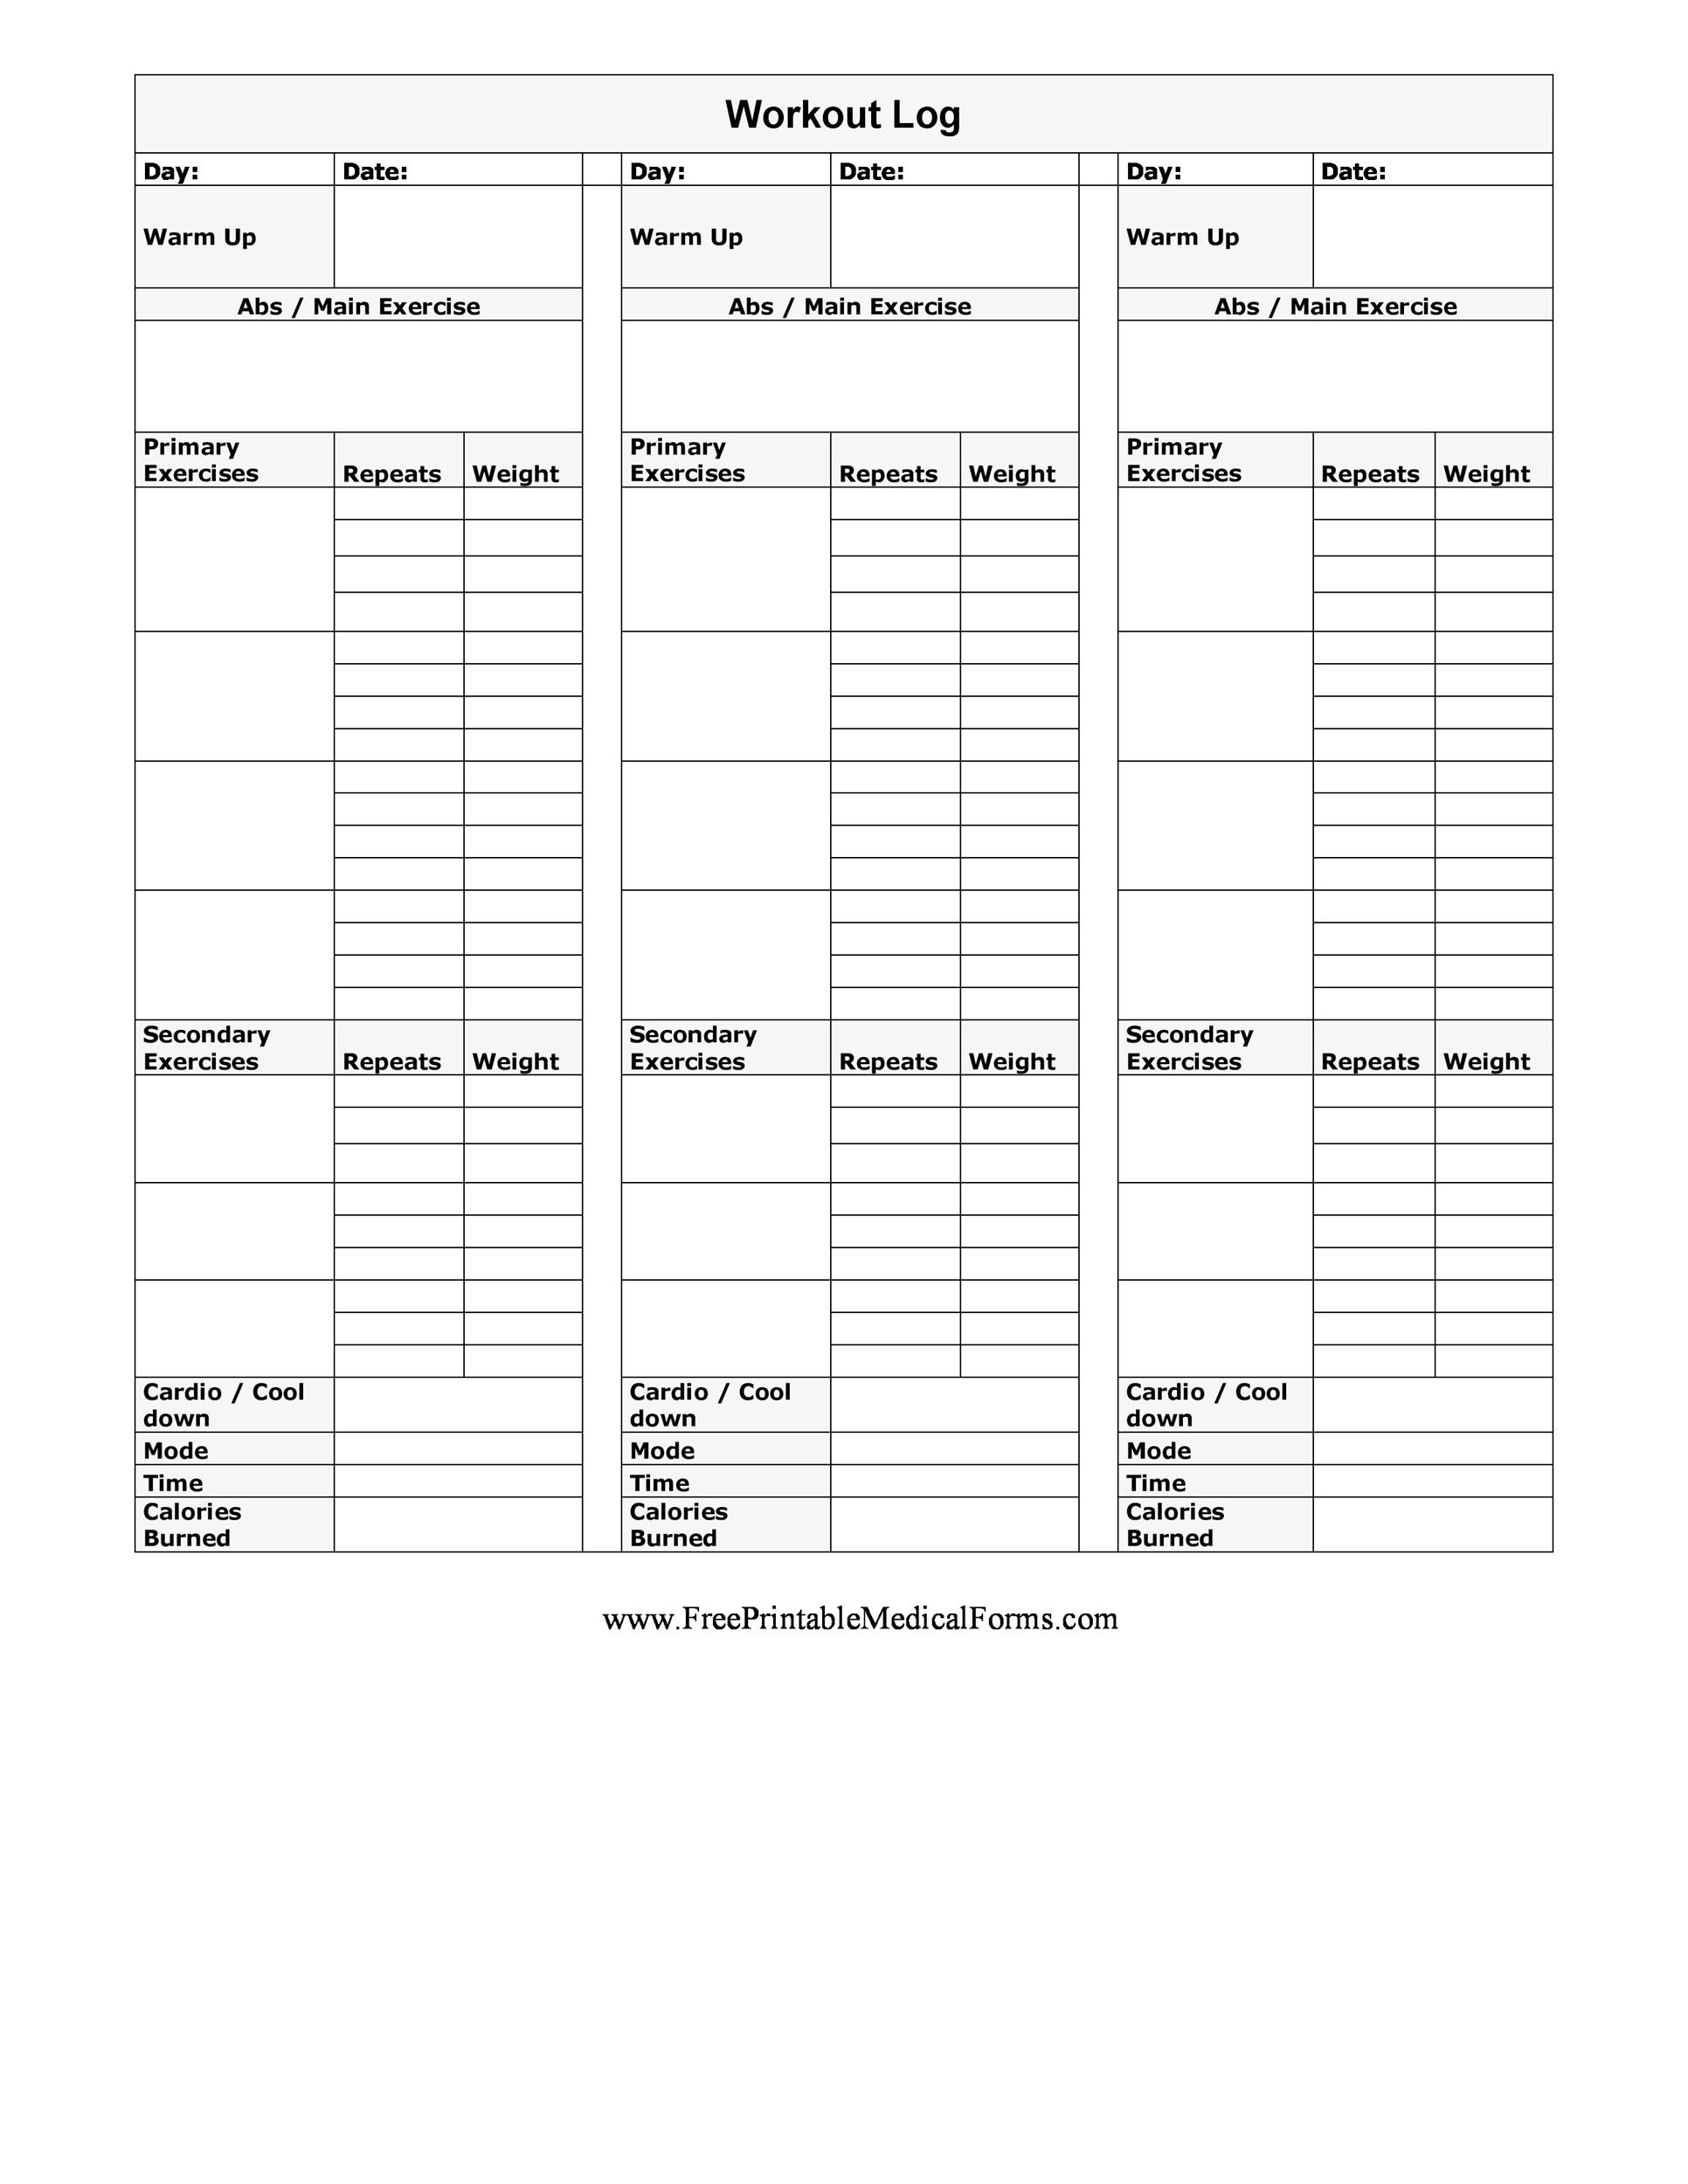 30 Day Lab Expiration Calendar   Printable Calendar Template 2020